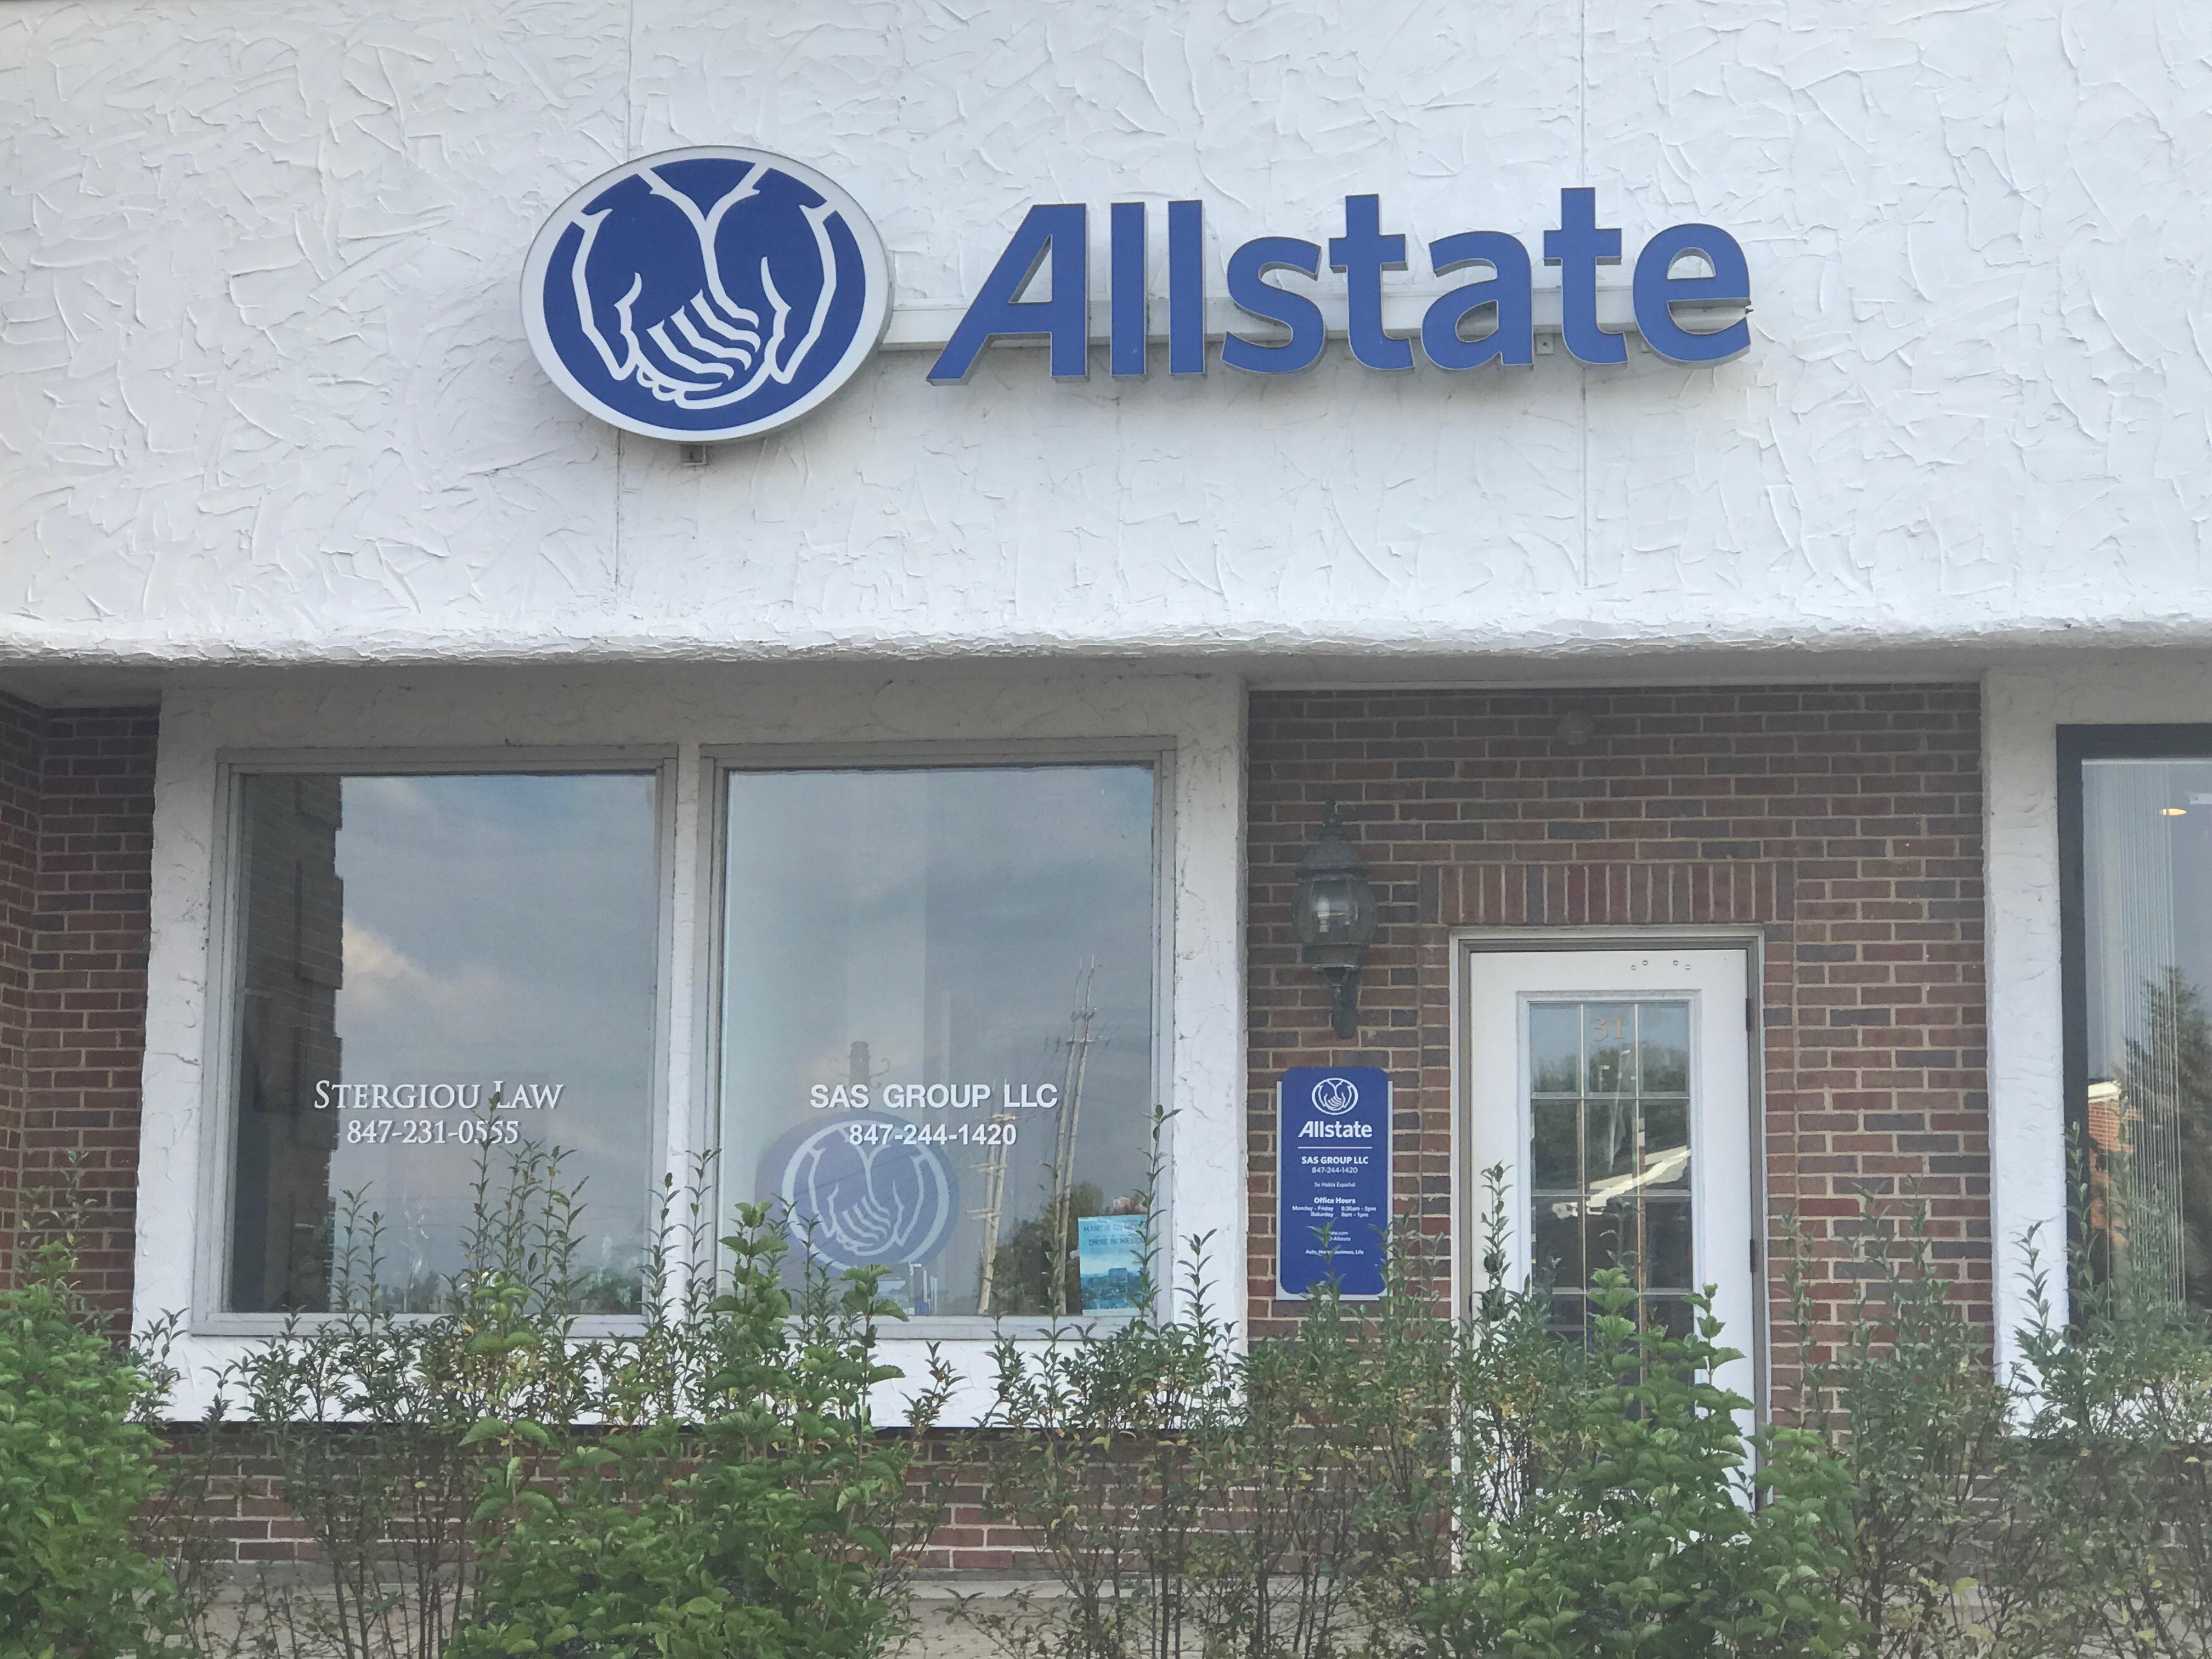 Steve Stavrinou: Allstate Insurance image 1